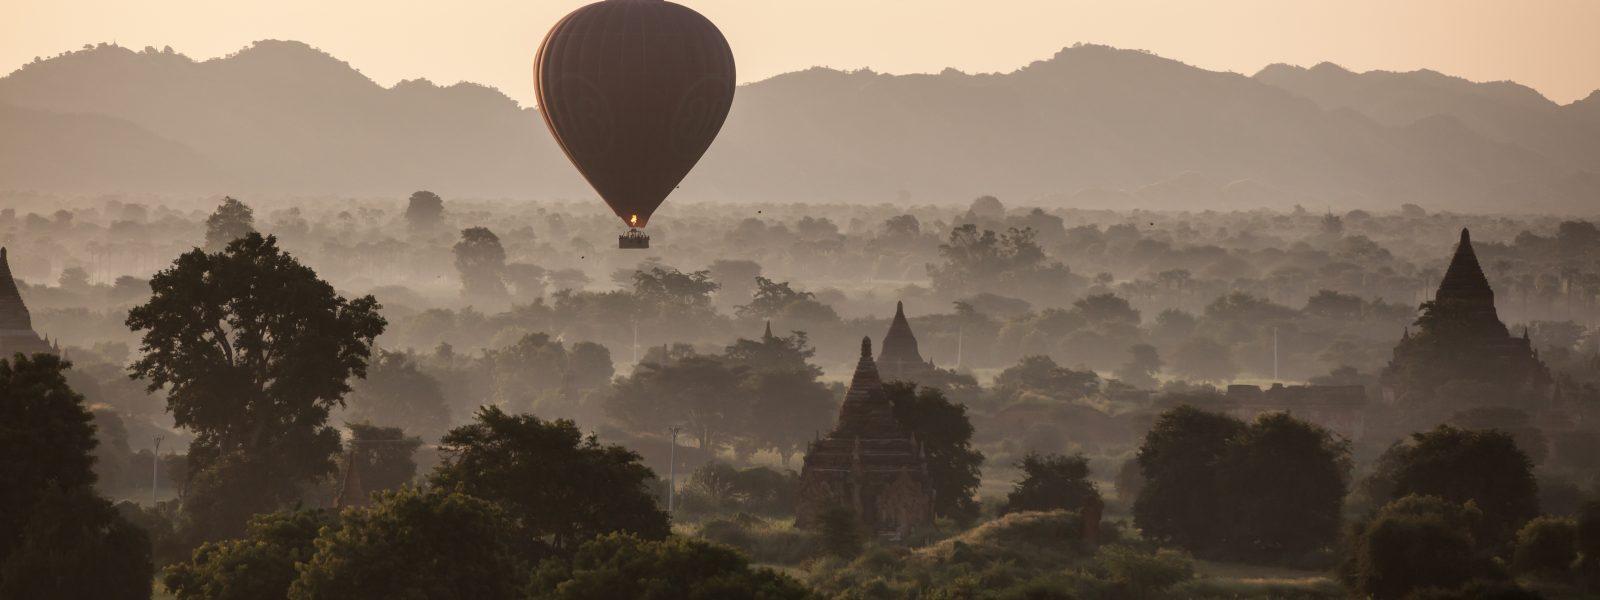 24 Hours in Bagan - Balloons with the trees - Myanmar - Sampan Travel